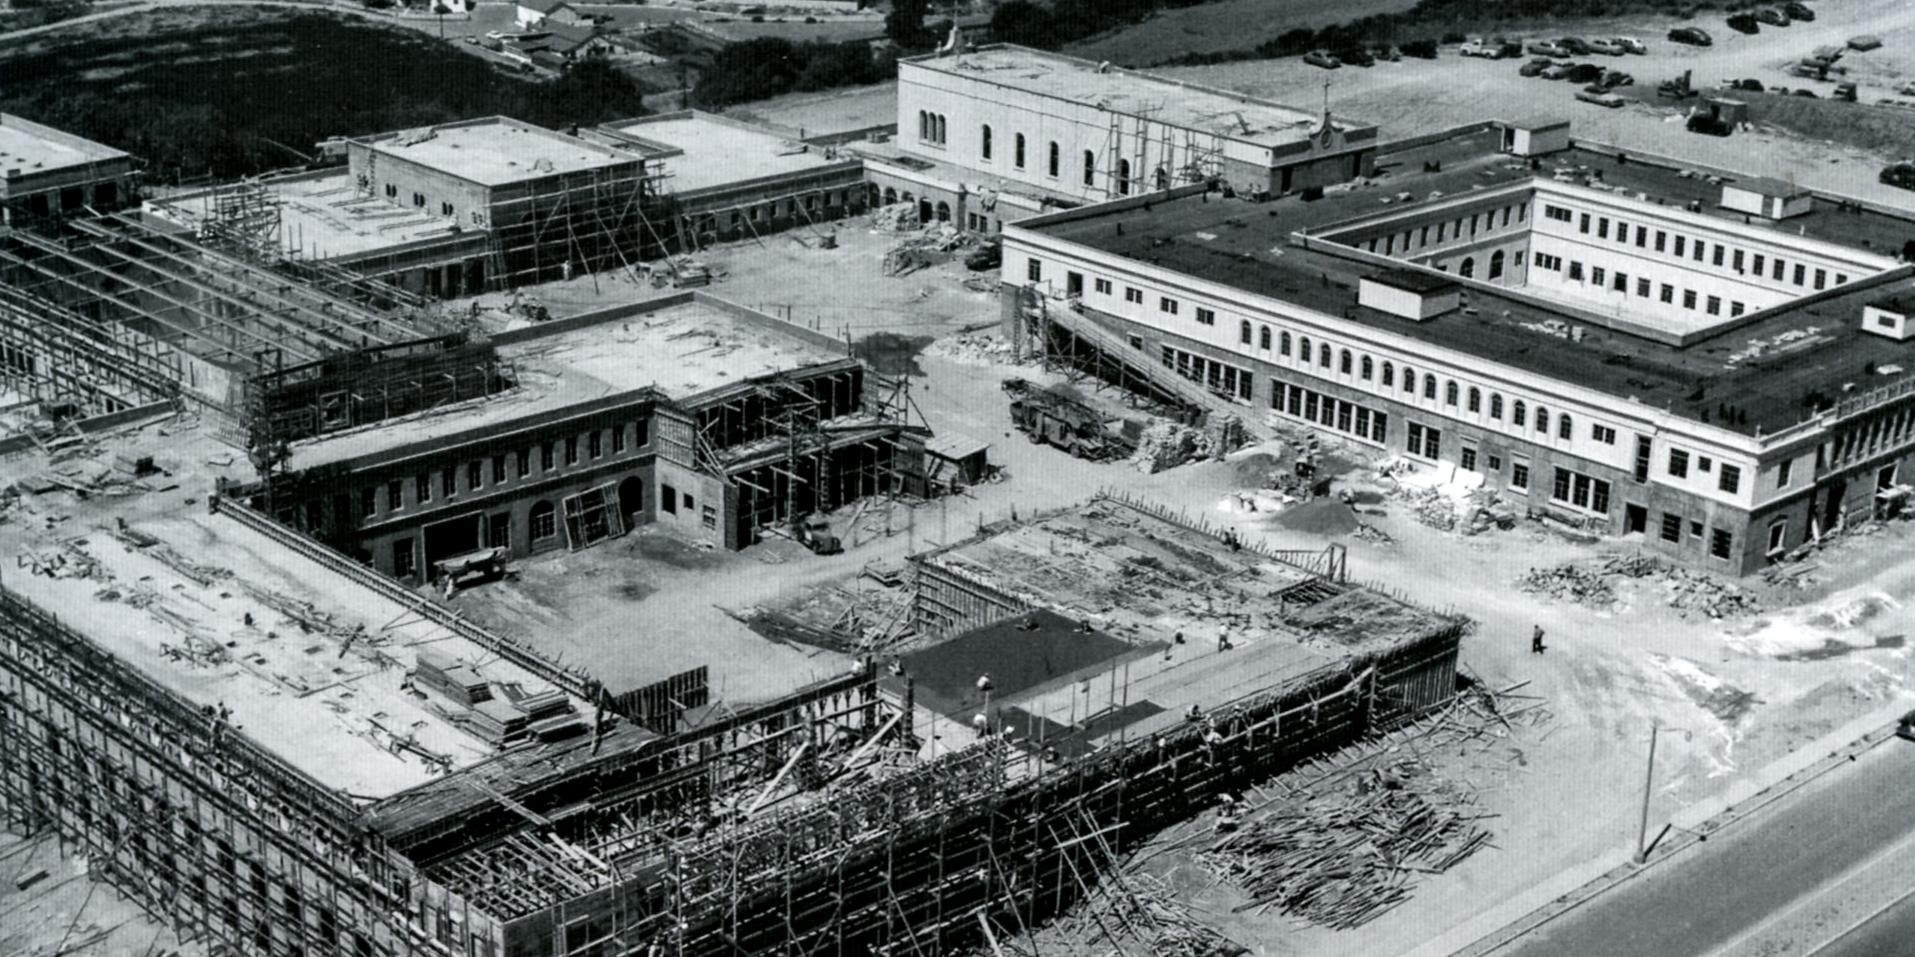 USD campus archival